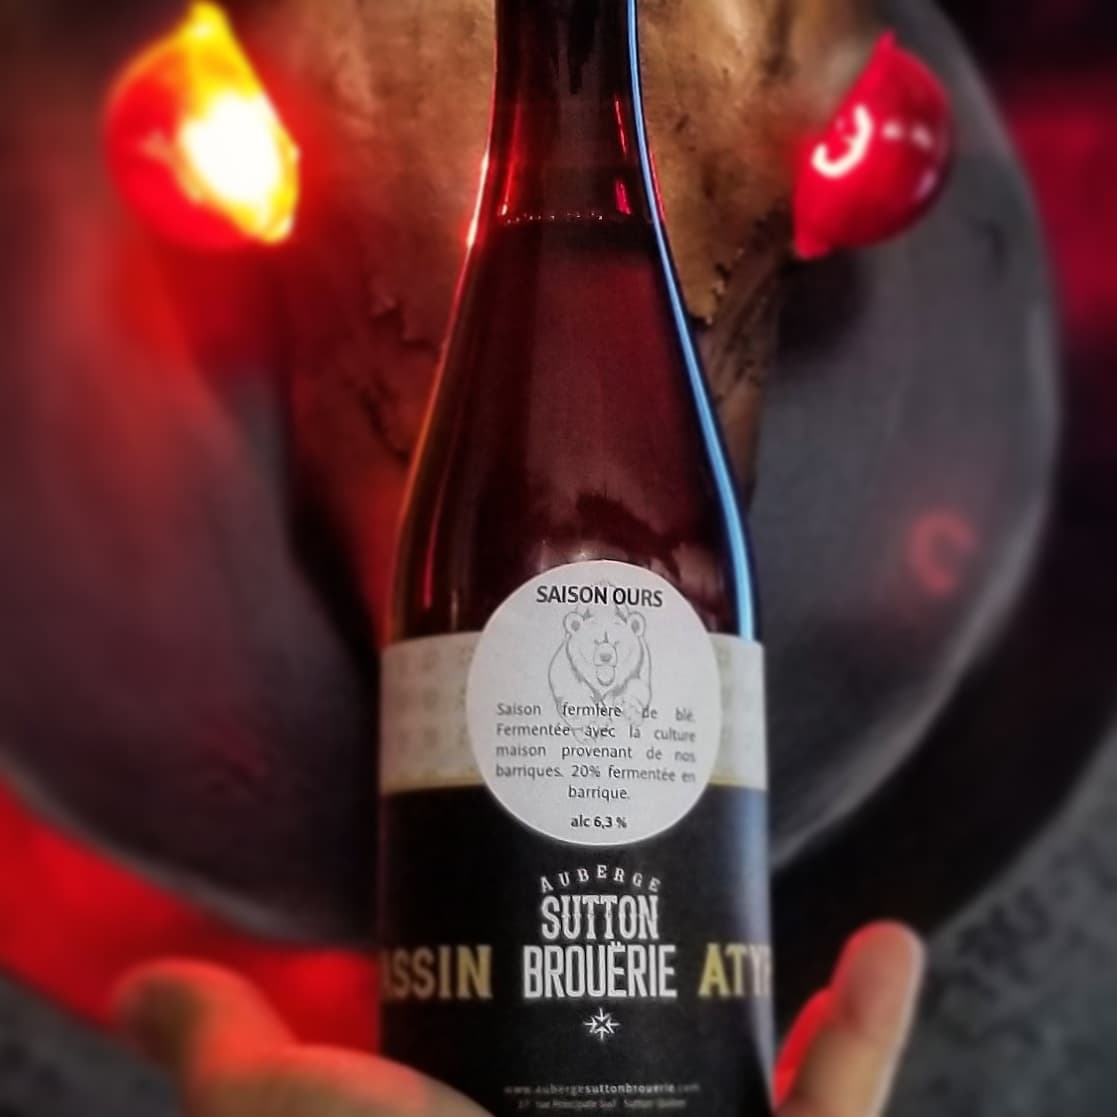 Bière Brassin Atypique de Microbrasserie | Restaurant, auberge et microbrasserie située en Estrie | Auberge Sutton Brouërie